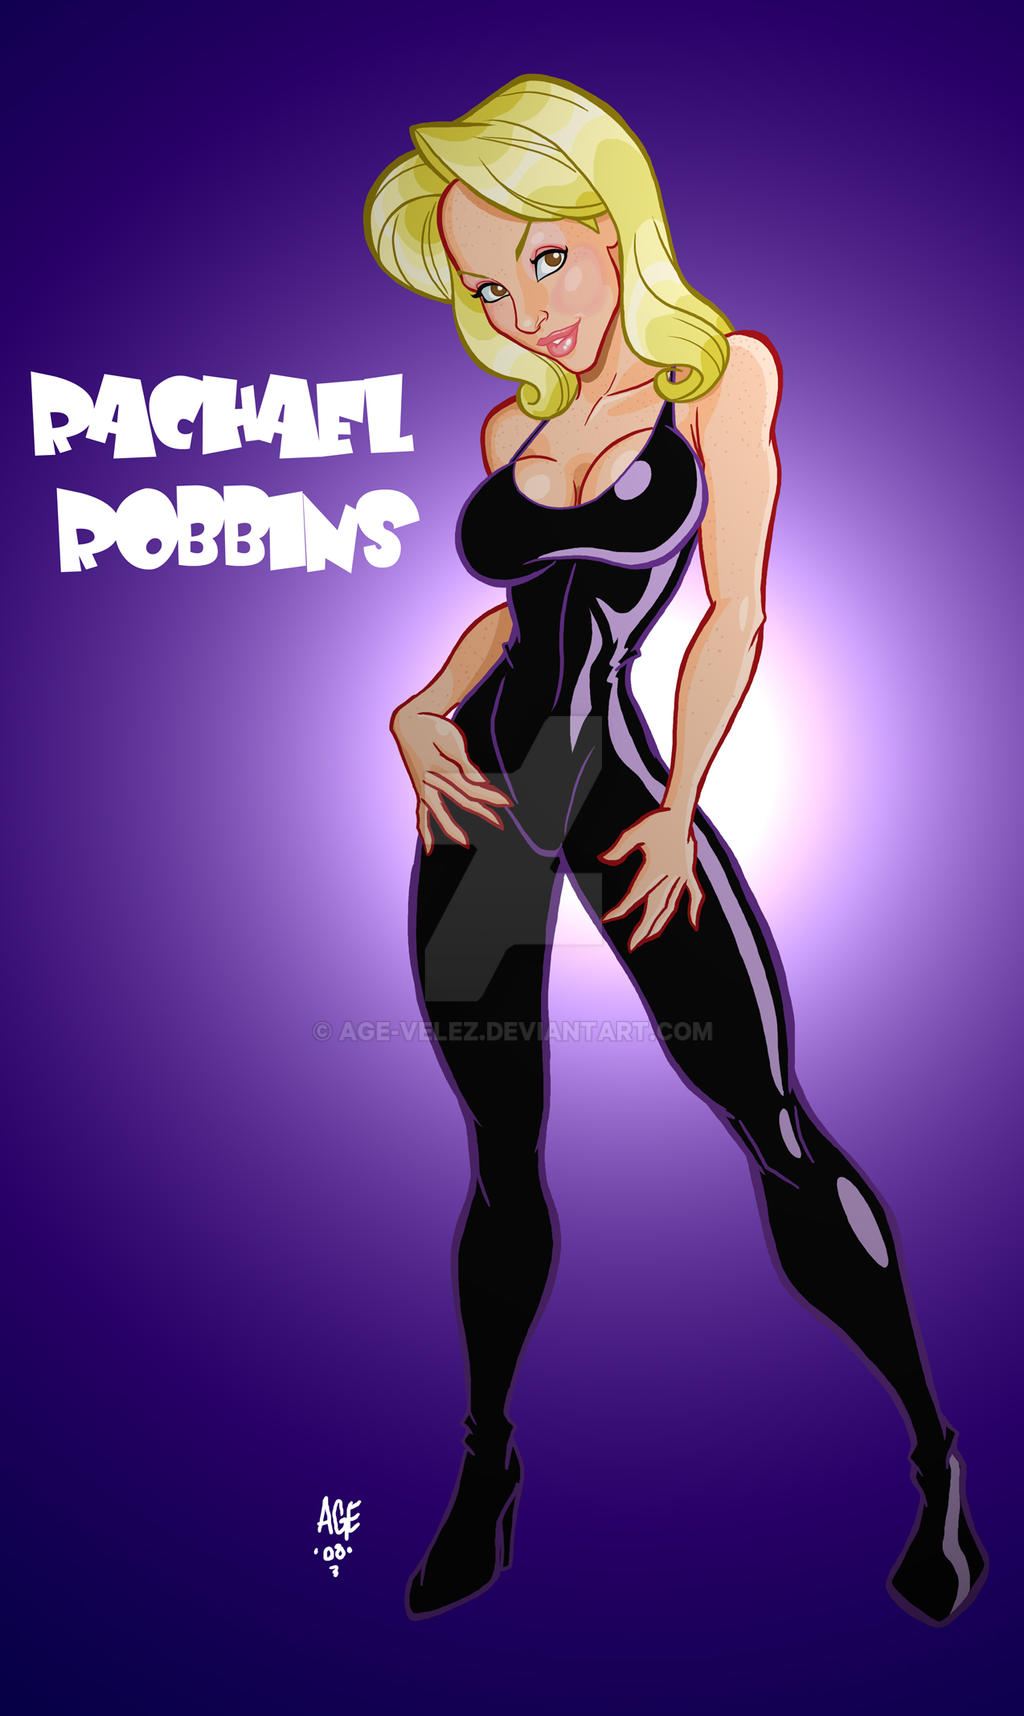 Con Girl Rachael Robbins by Age-Velez